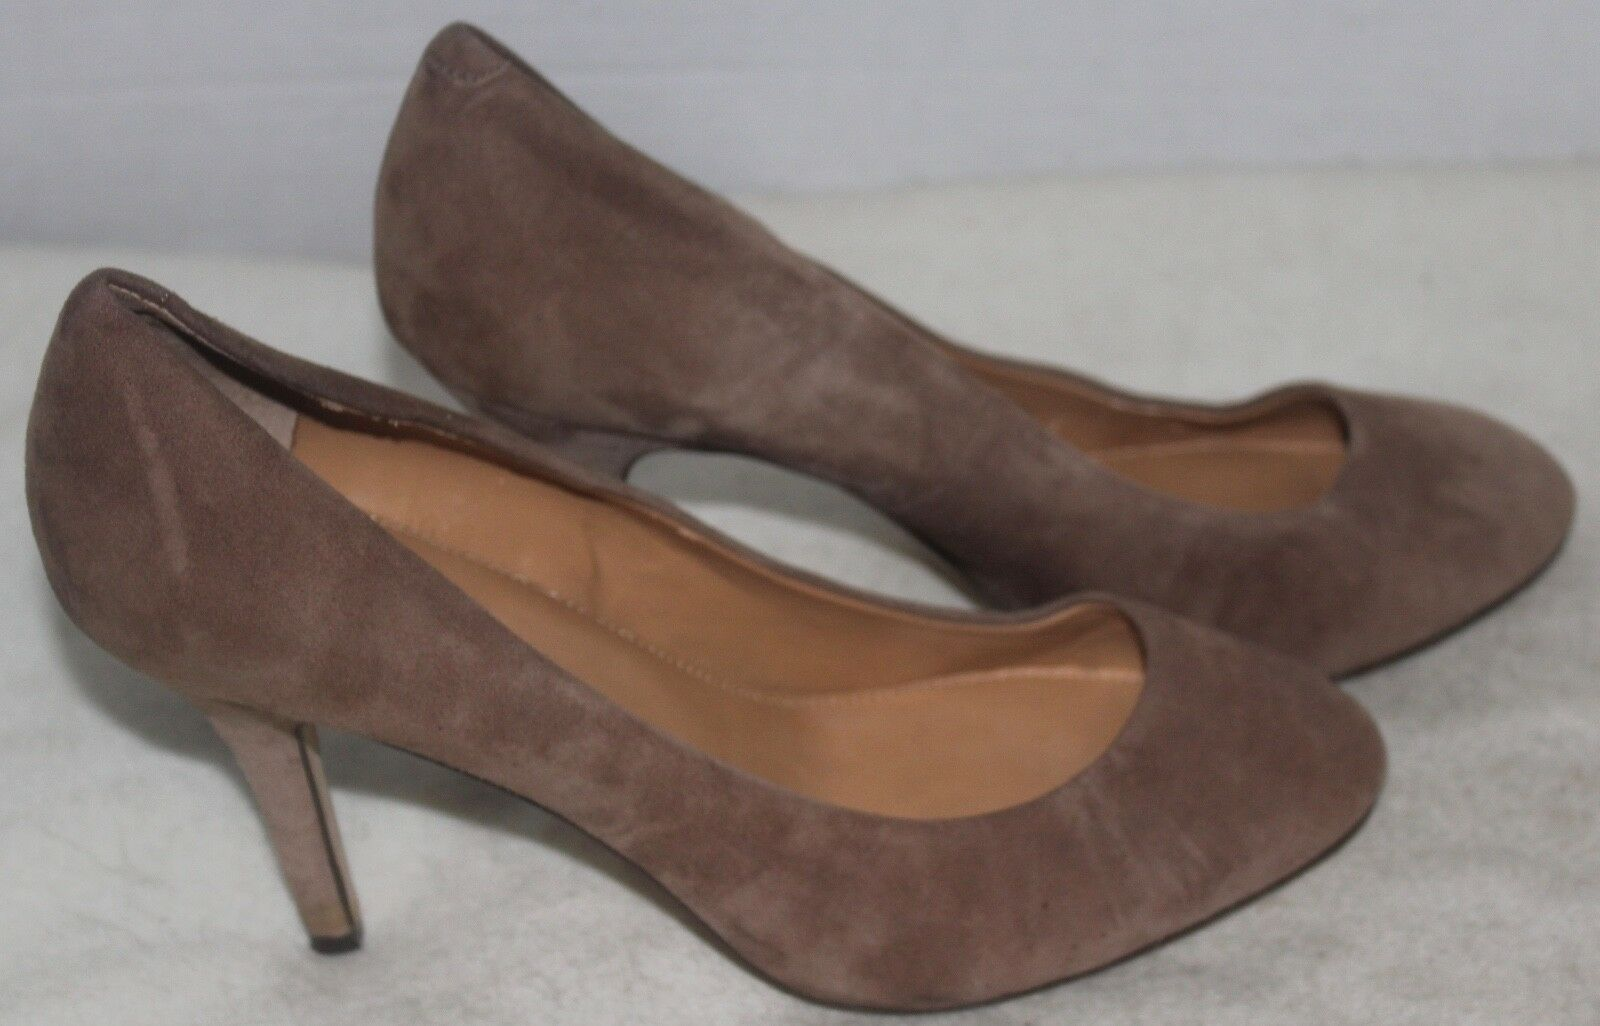 J.CREW  245 245 245 damen's Größe 8.5 Tan Suede Classic Pumps Heels Größe 8.5 f97fb5